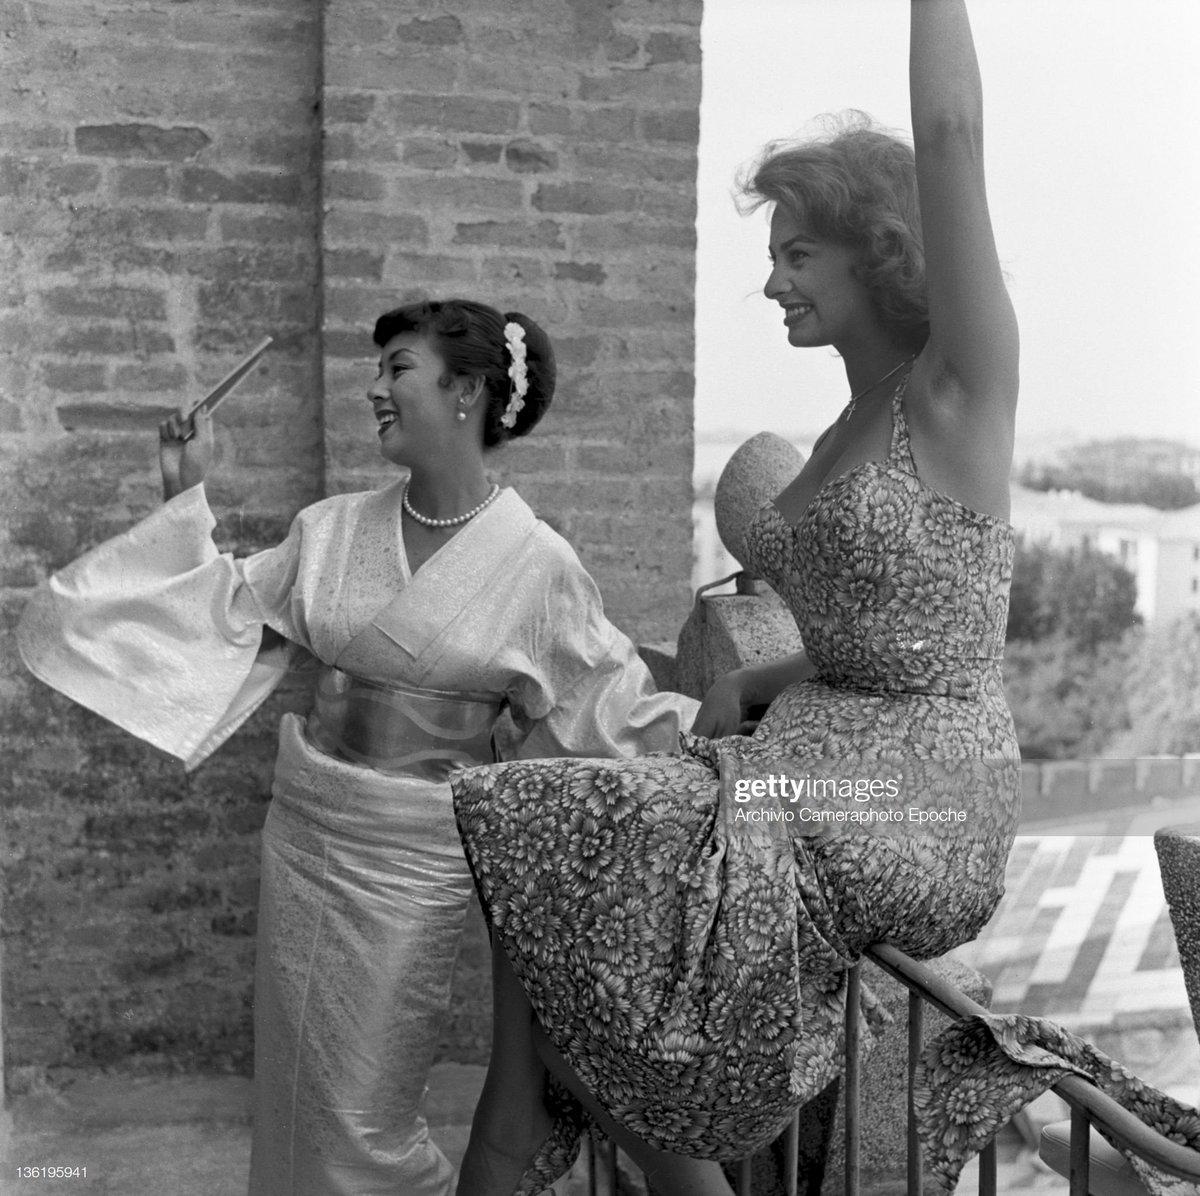 R Emmet Sweeney On Twitter Machiko Kyo And Sophia Loren At The Venice Film Festival 1955 Kyo Was Promoting Mizoguchi S Princess Yang Kwei Fei